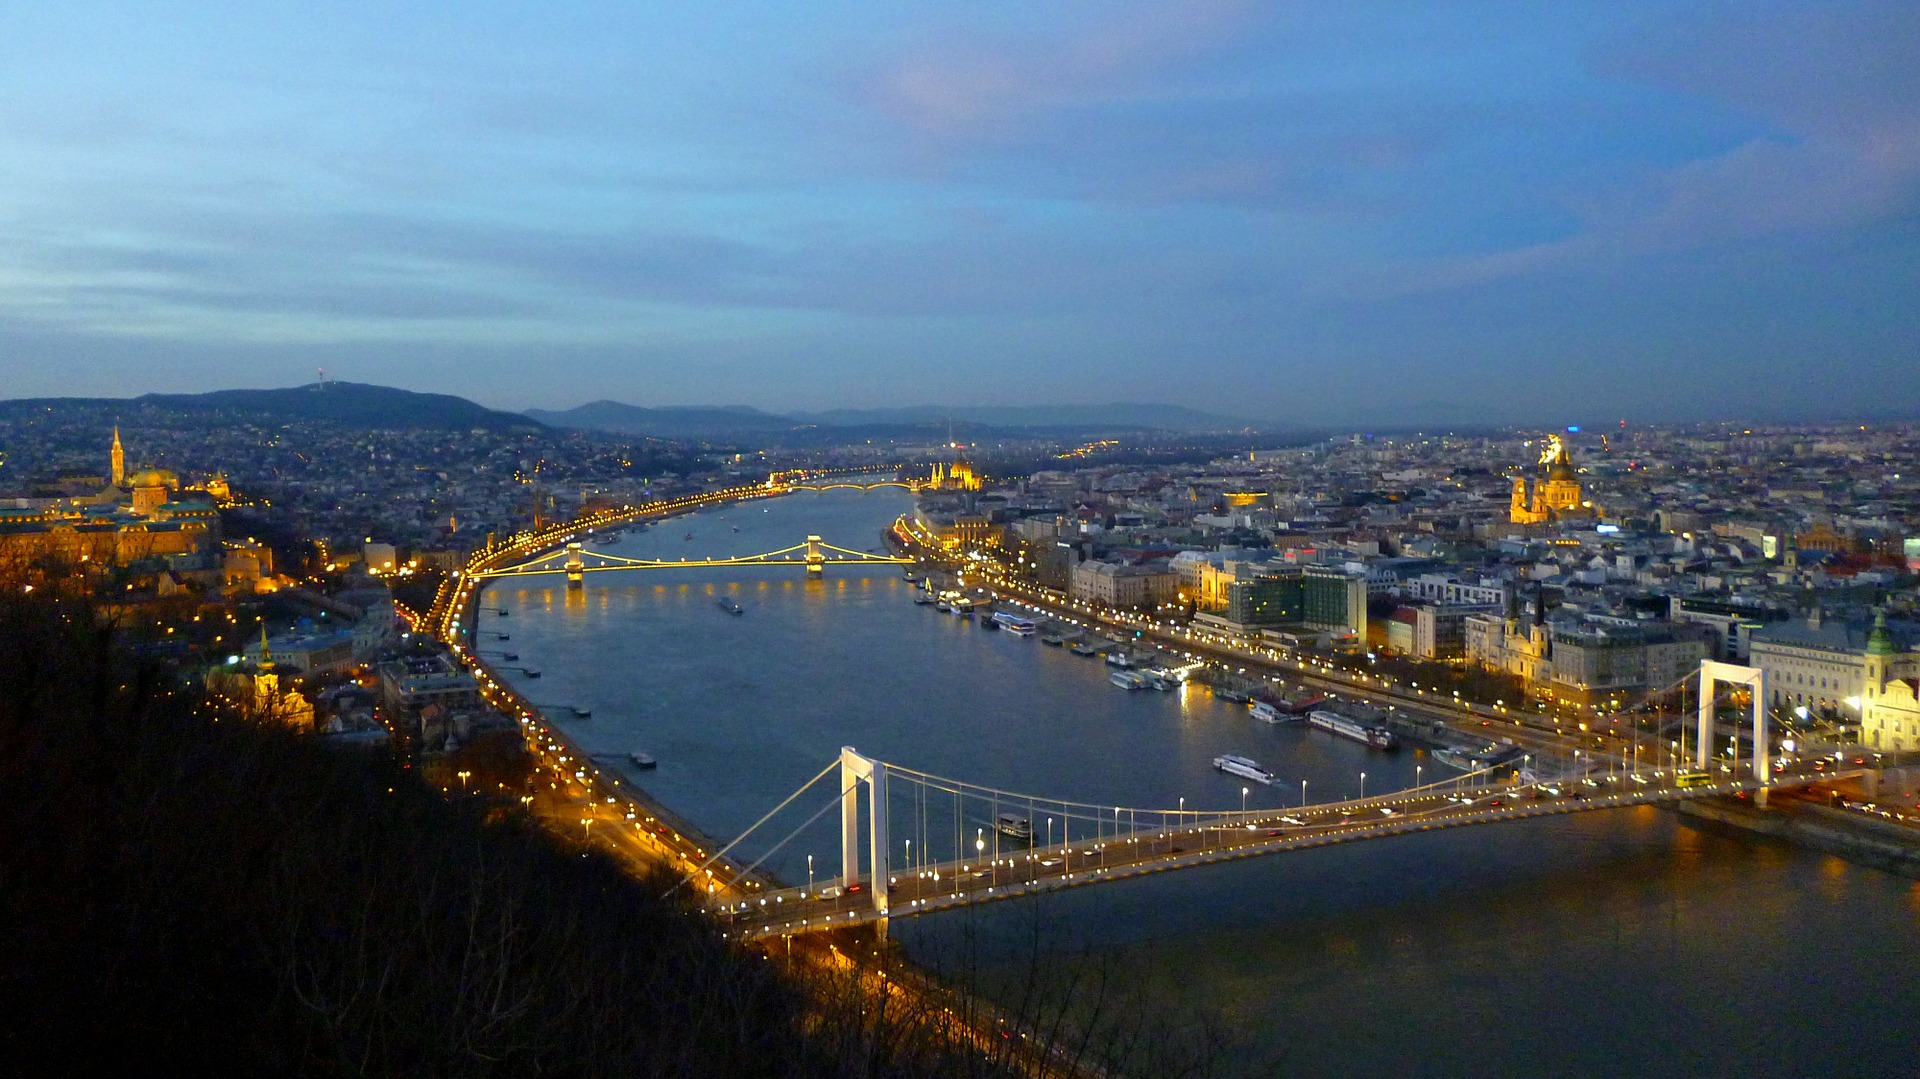 budapest-267671_1920.jpg